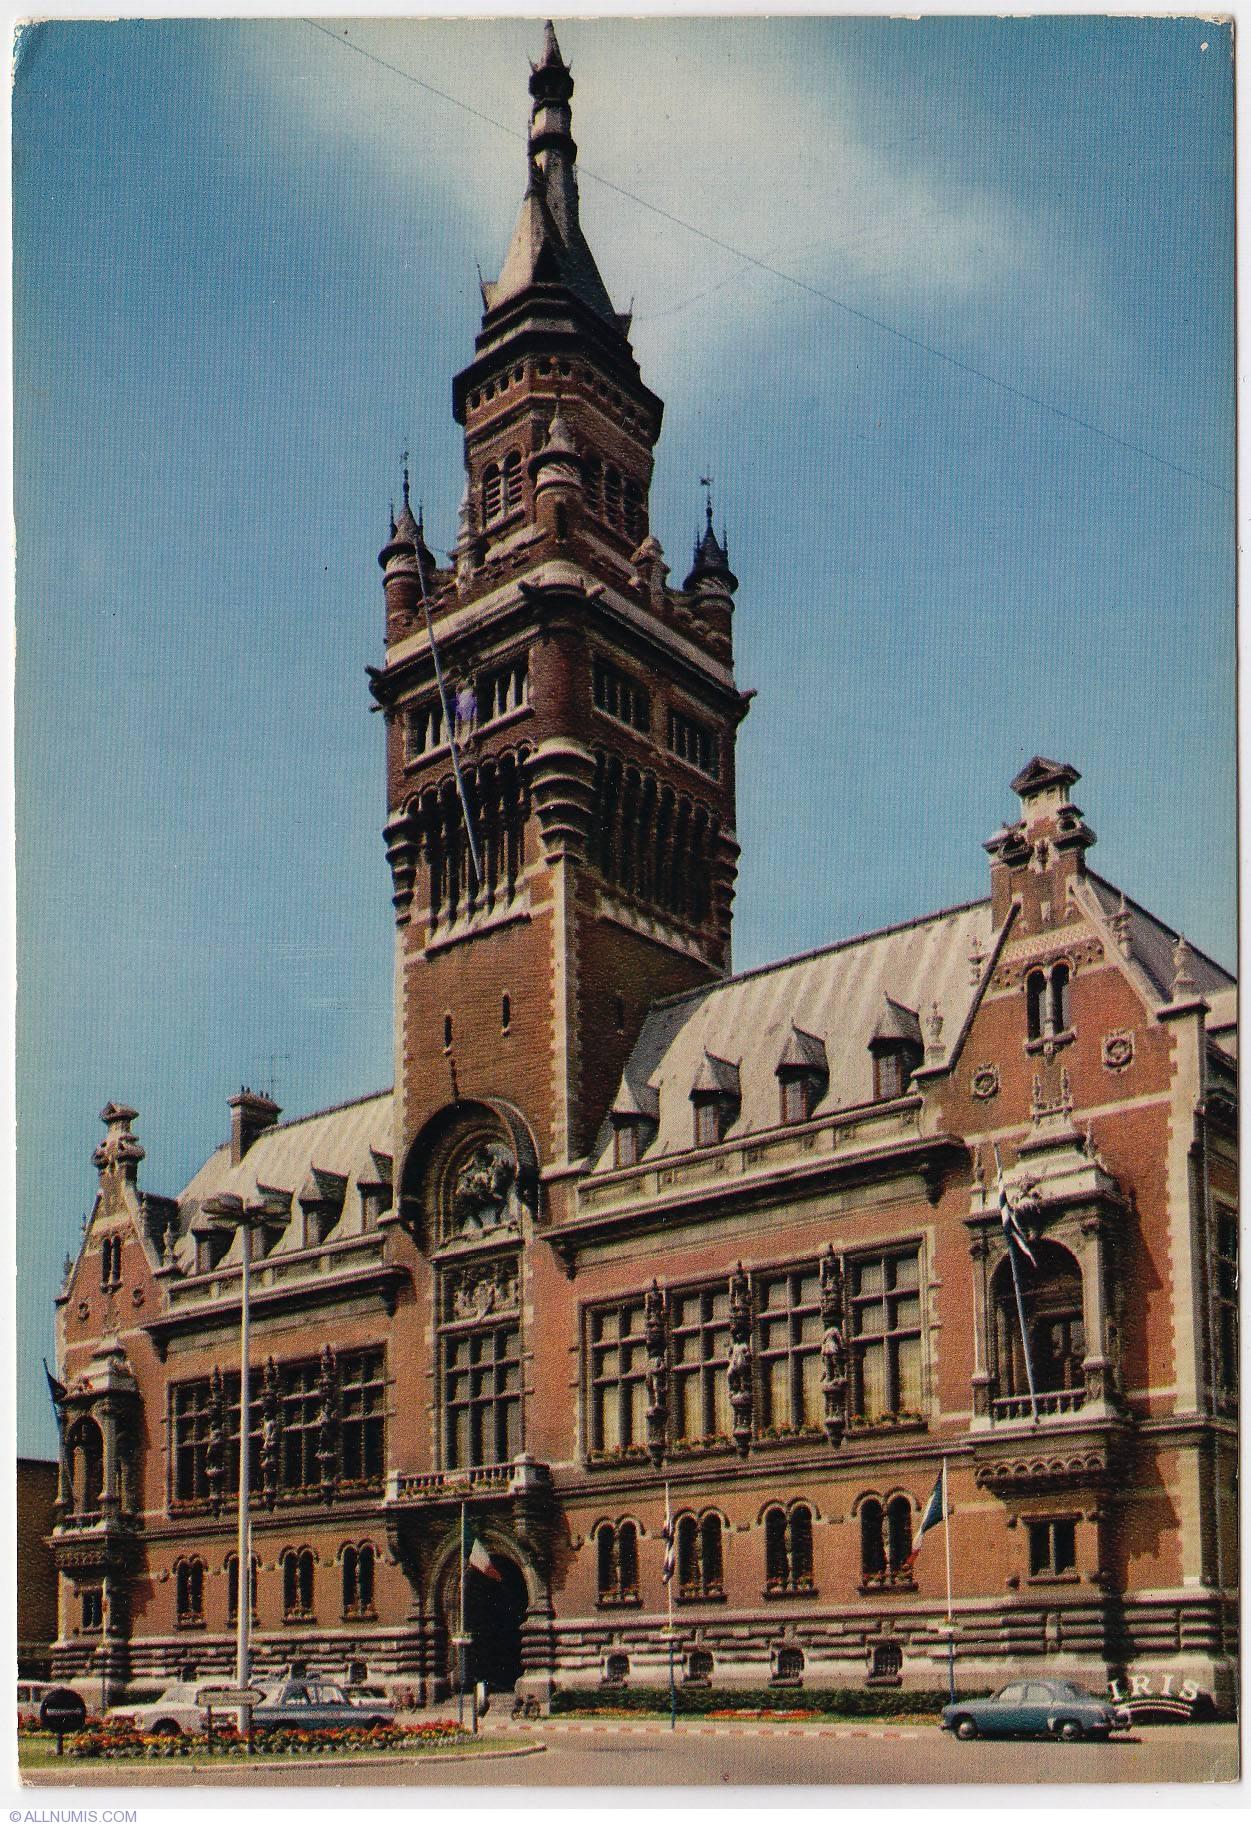 Dunkirk City Hall Nord Pas De Calais France Postcard